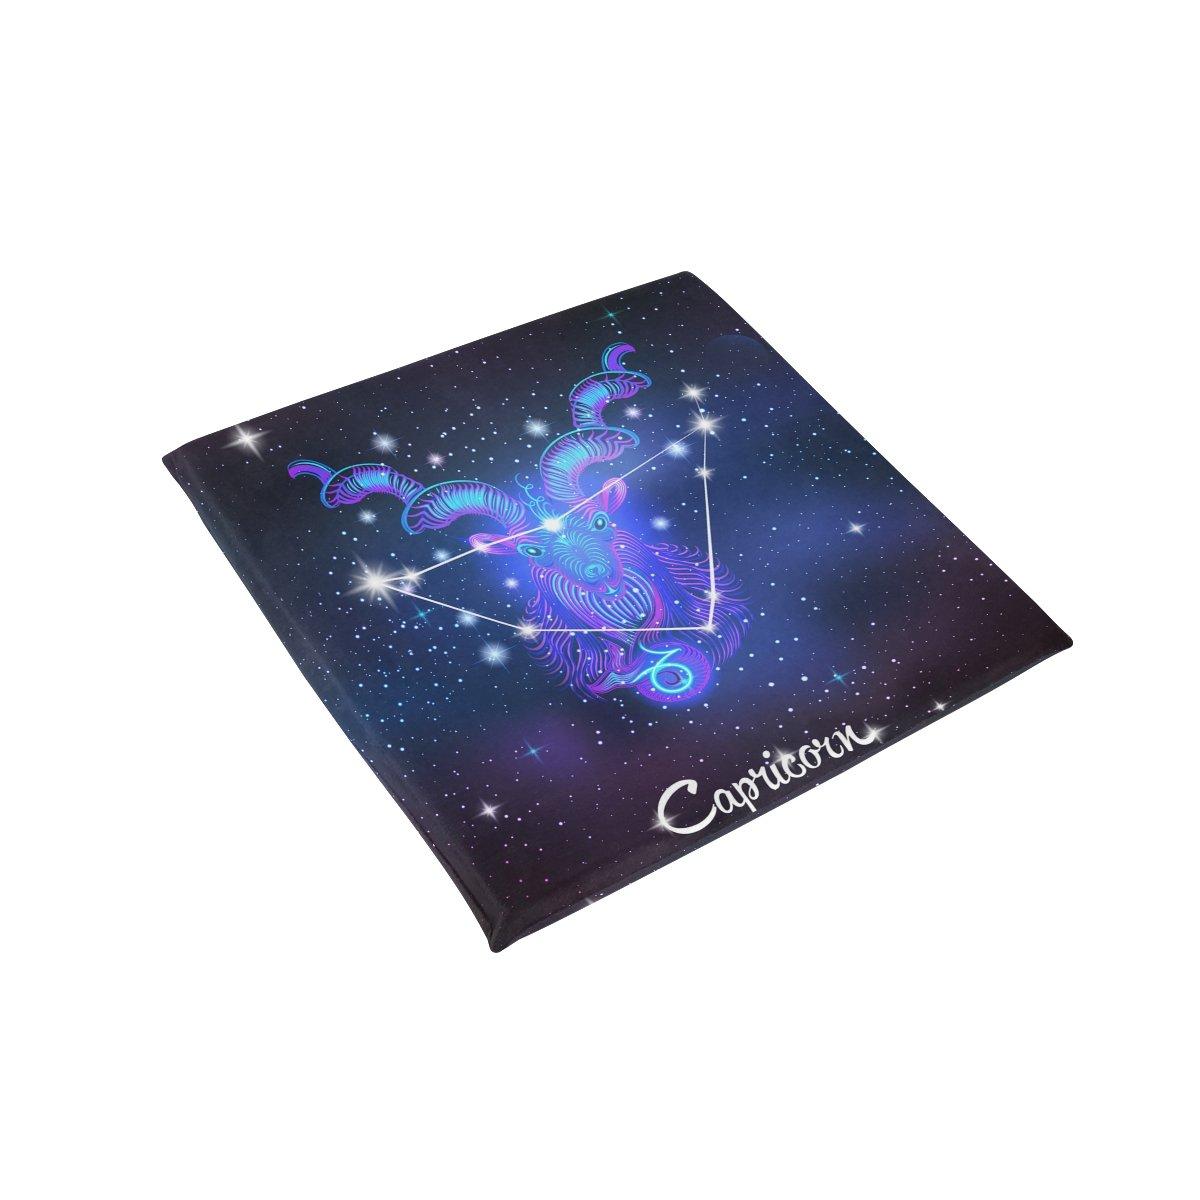 Constellation Zodiac Sign Capricorn Memory Foam Chair Pads Car Seat Cushion,16 x 16 inches